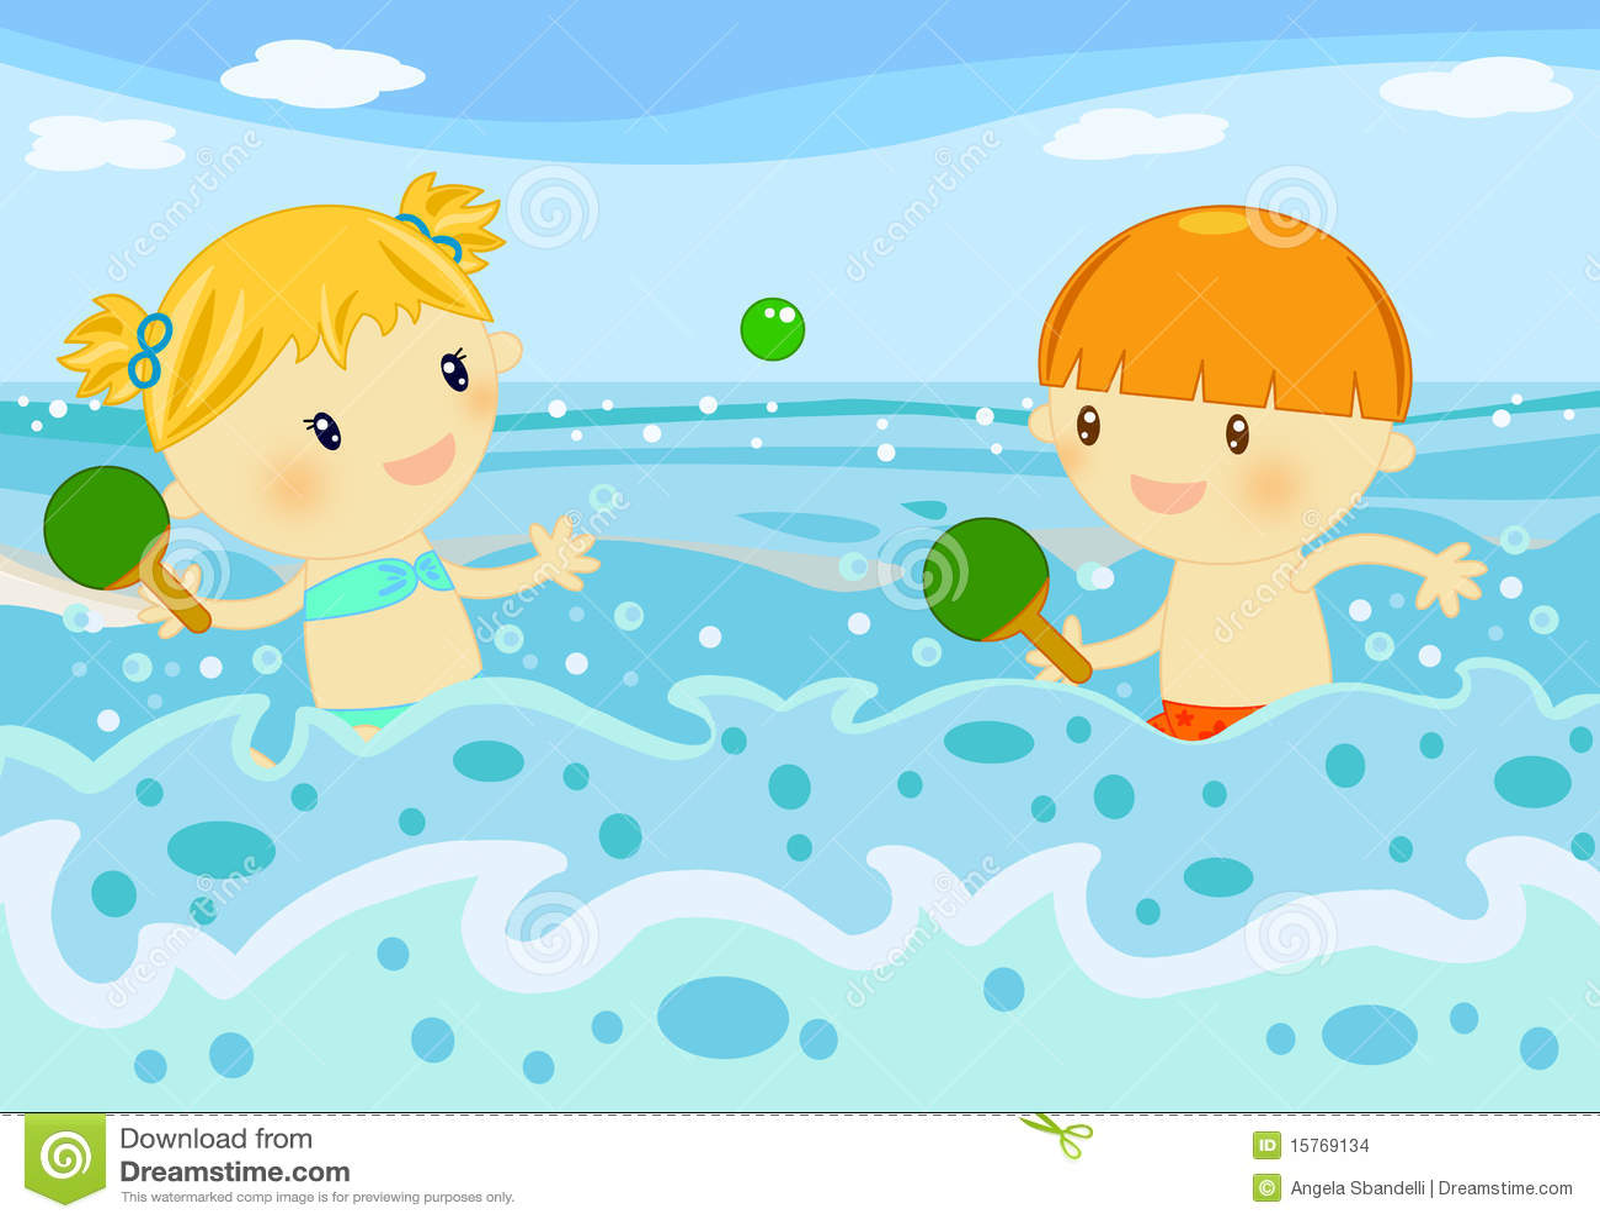 children playing rackets in the sea stock illustration rh dreamstime com Beach Clip Art Ocean Animals Clip Art